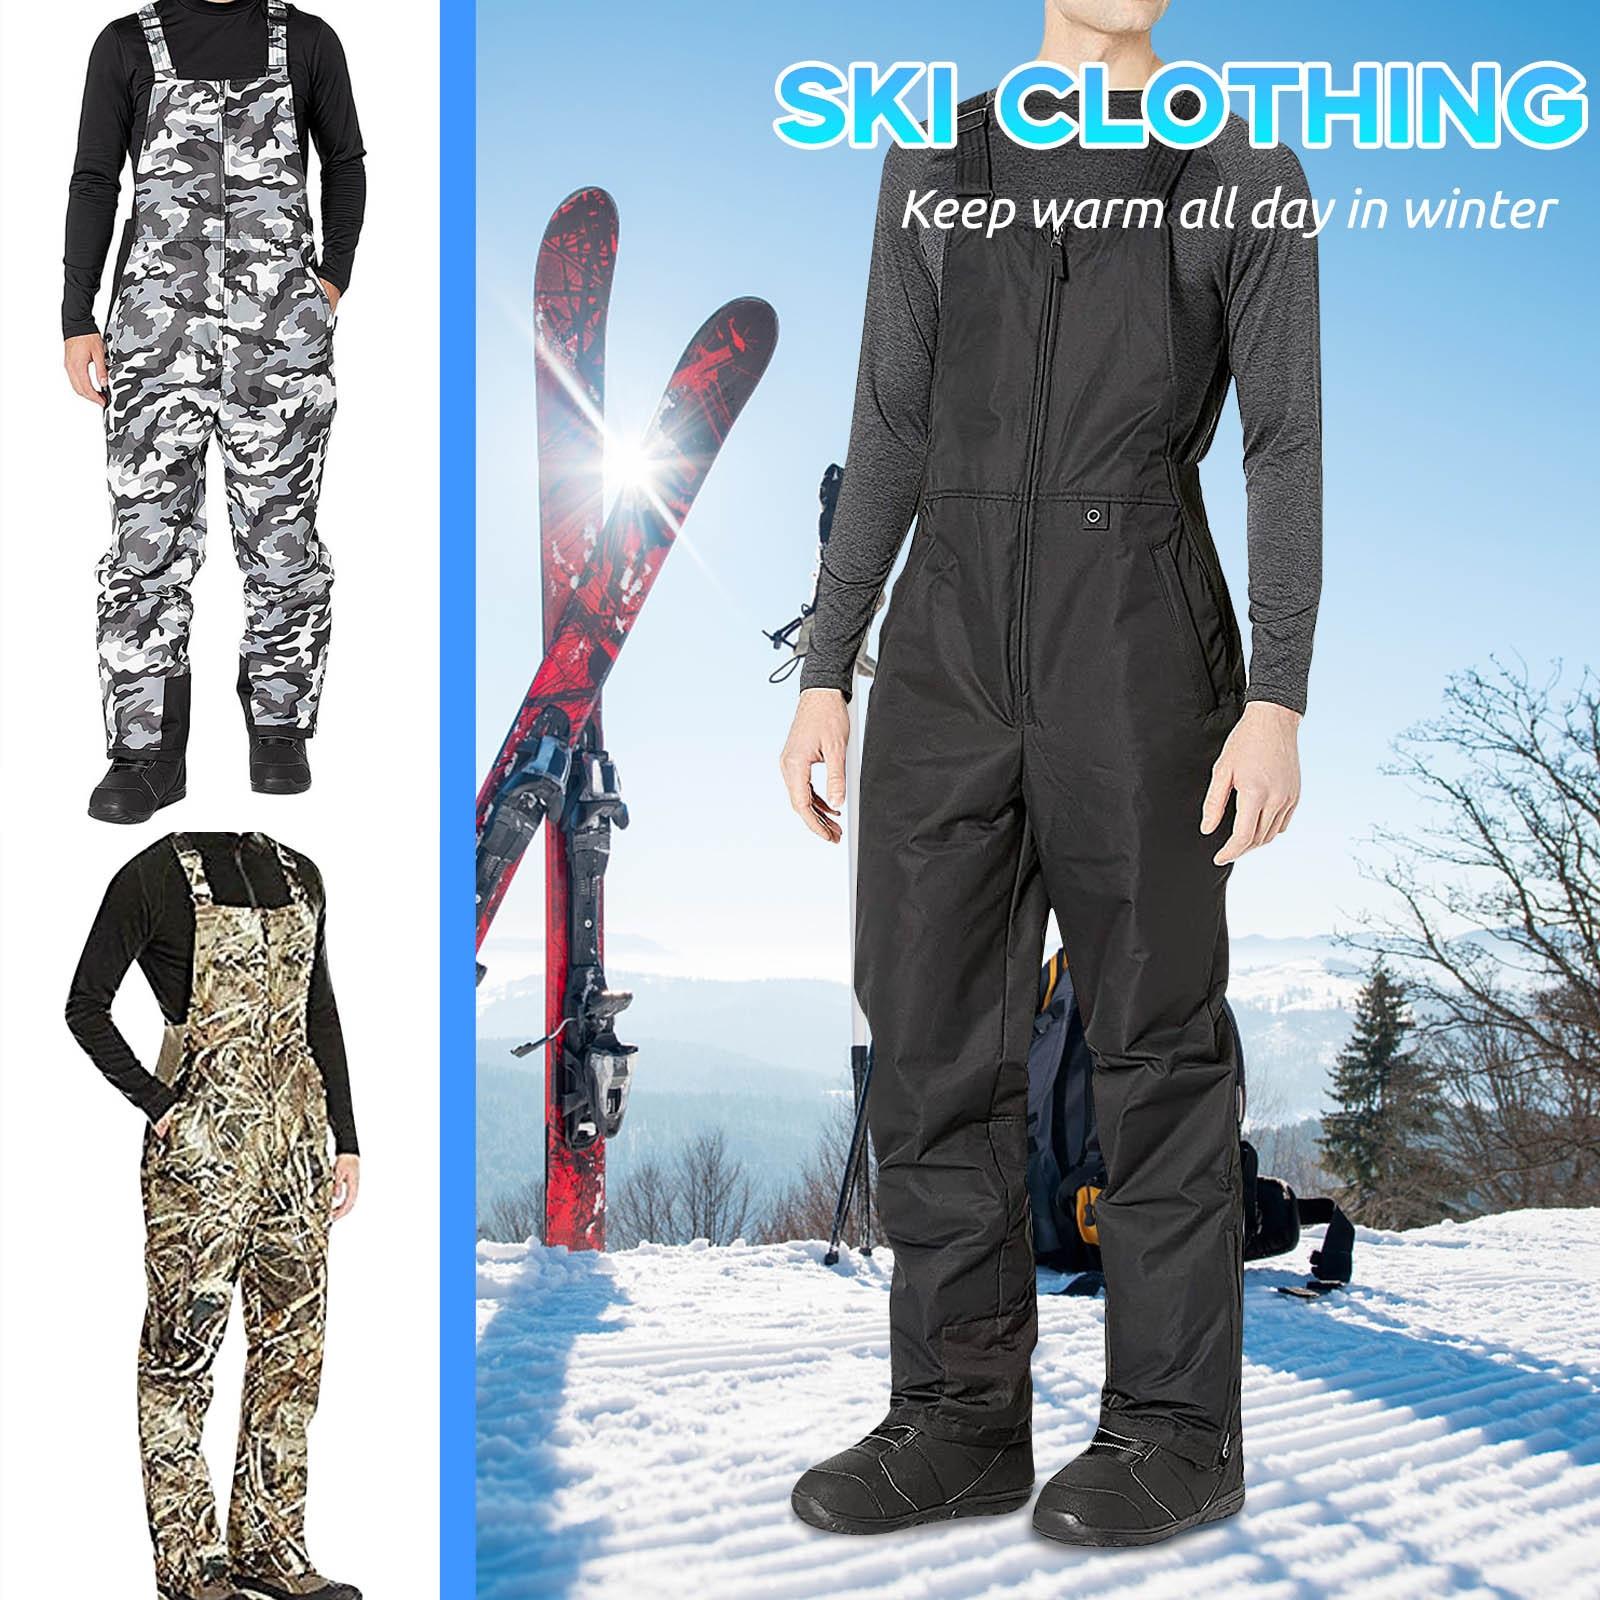 Ski Pants Women And Men Suspenders Outdoor Sports Solid Pocket Windproof Waterproof Warm Winter Snow Snowboard Trousers S-5xl